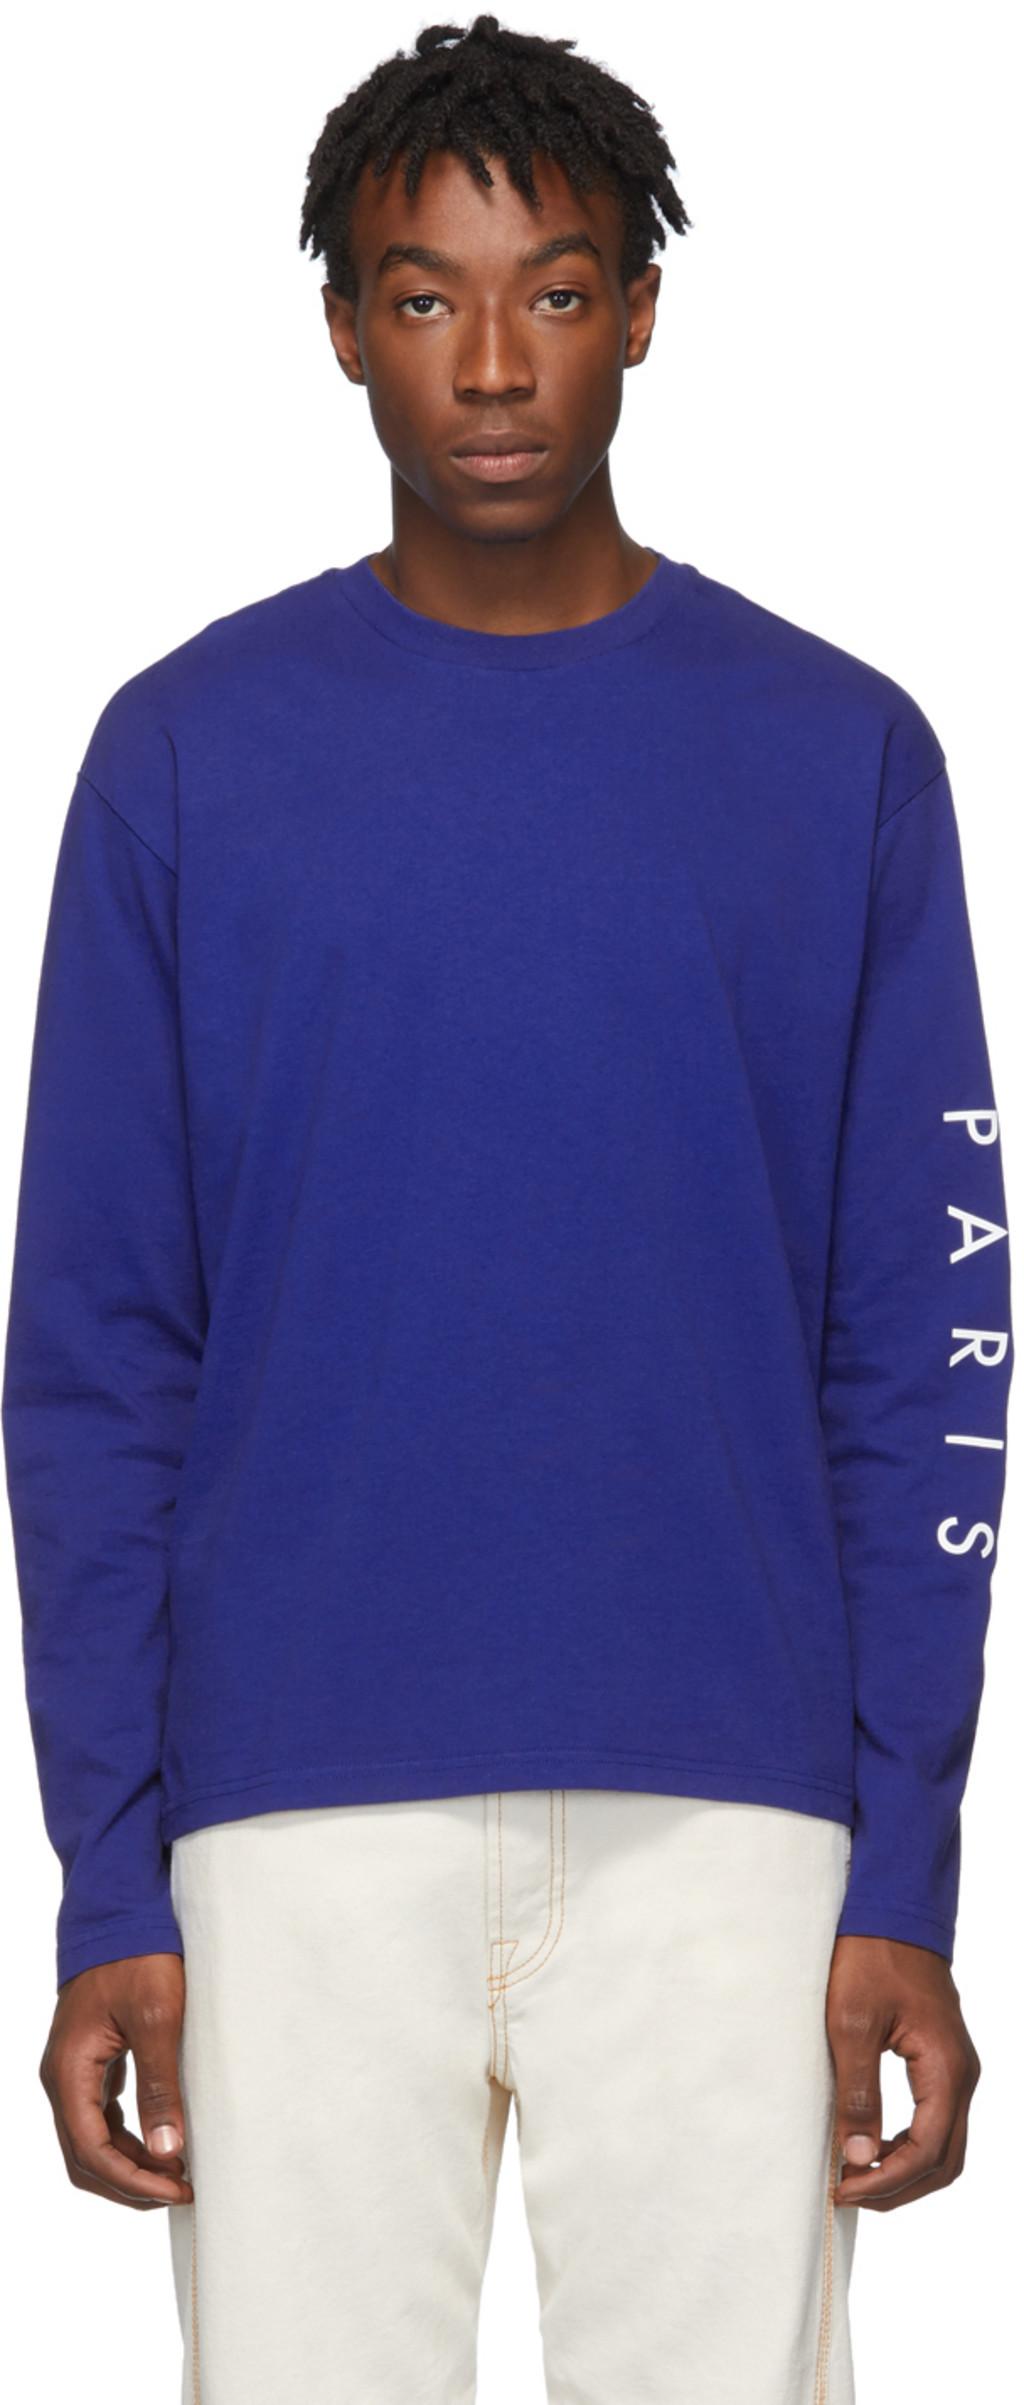 19e2212031 Blue Skate Long Sleeve T-Shirt